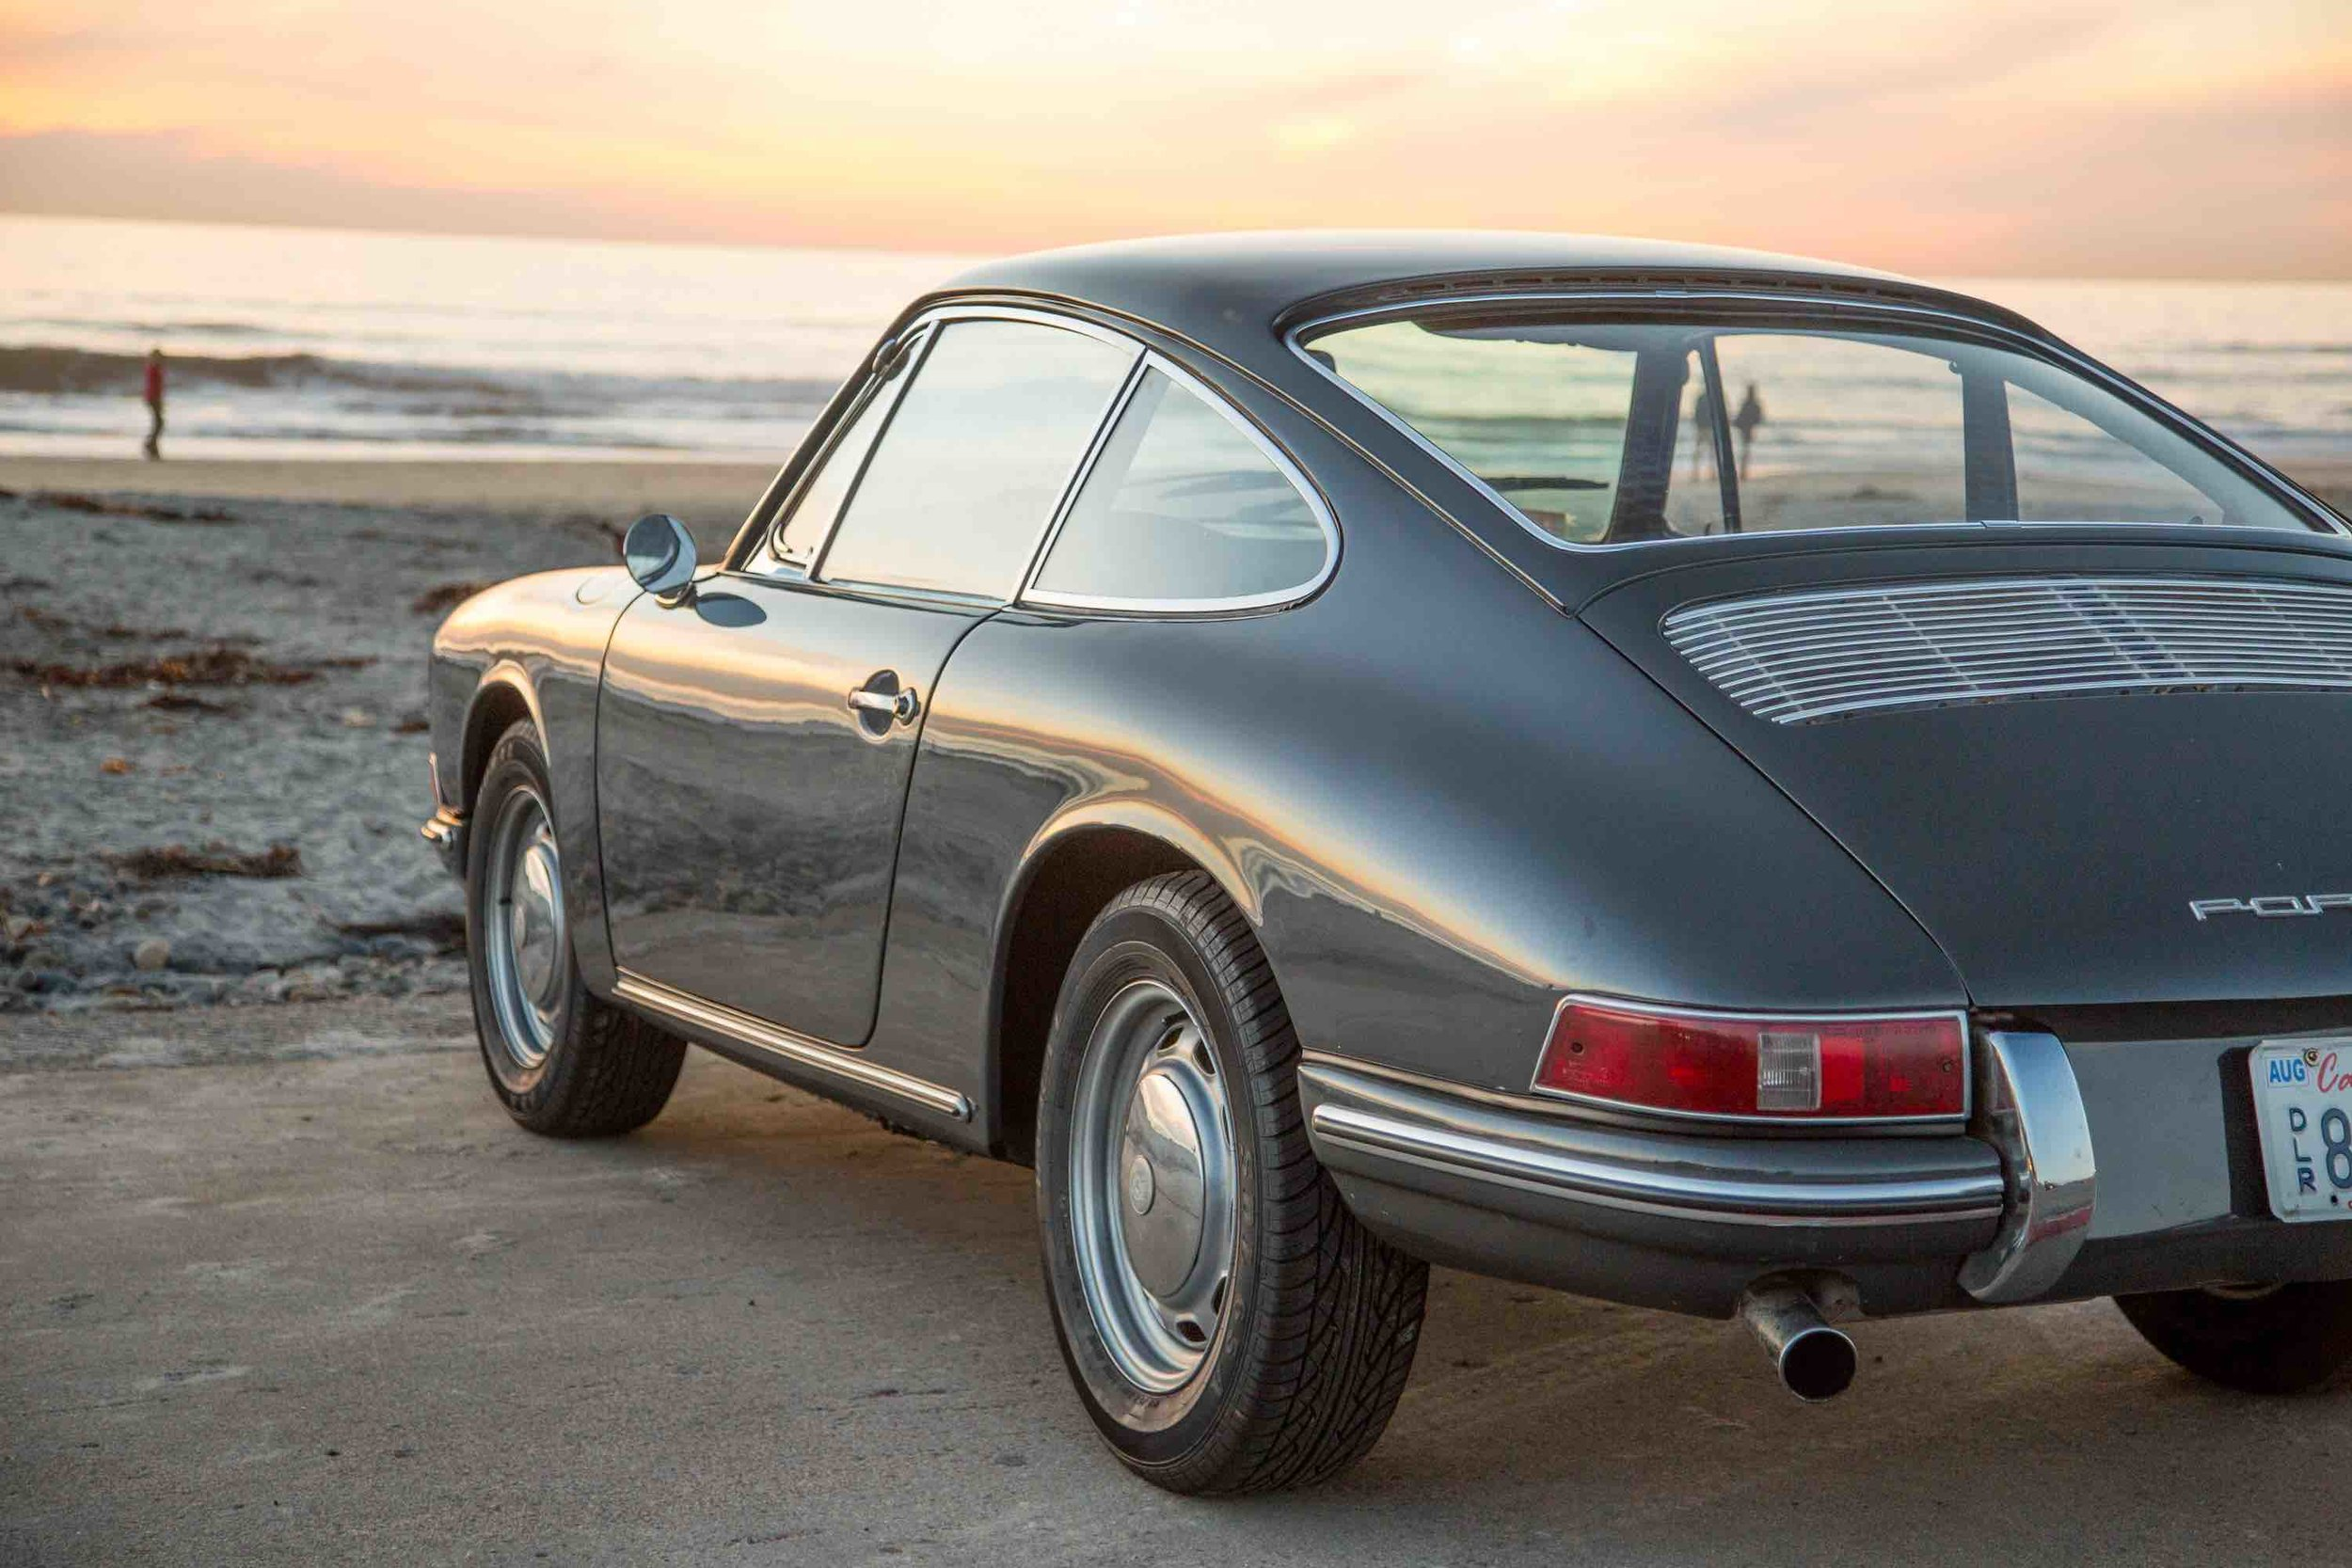 1966-porsche-912-slate-grey-makellos-classics-driver-side-rear-angle-exterior.jpeg